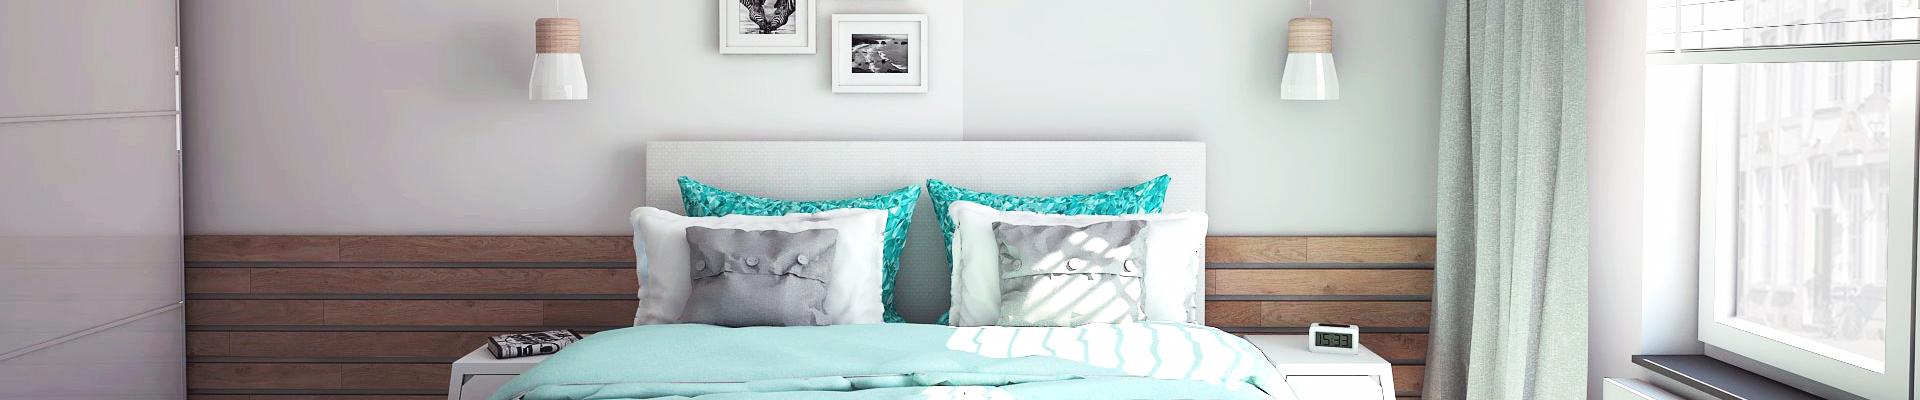 Turquoise slaapkamer - Studio em